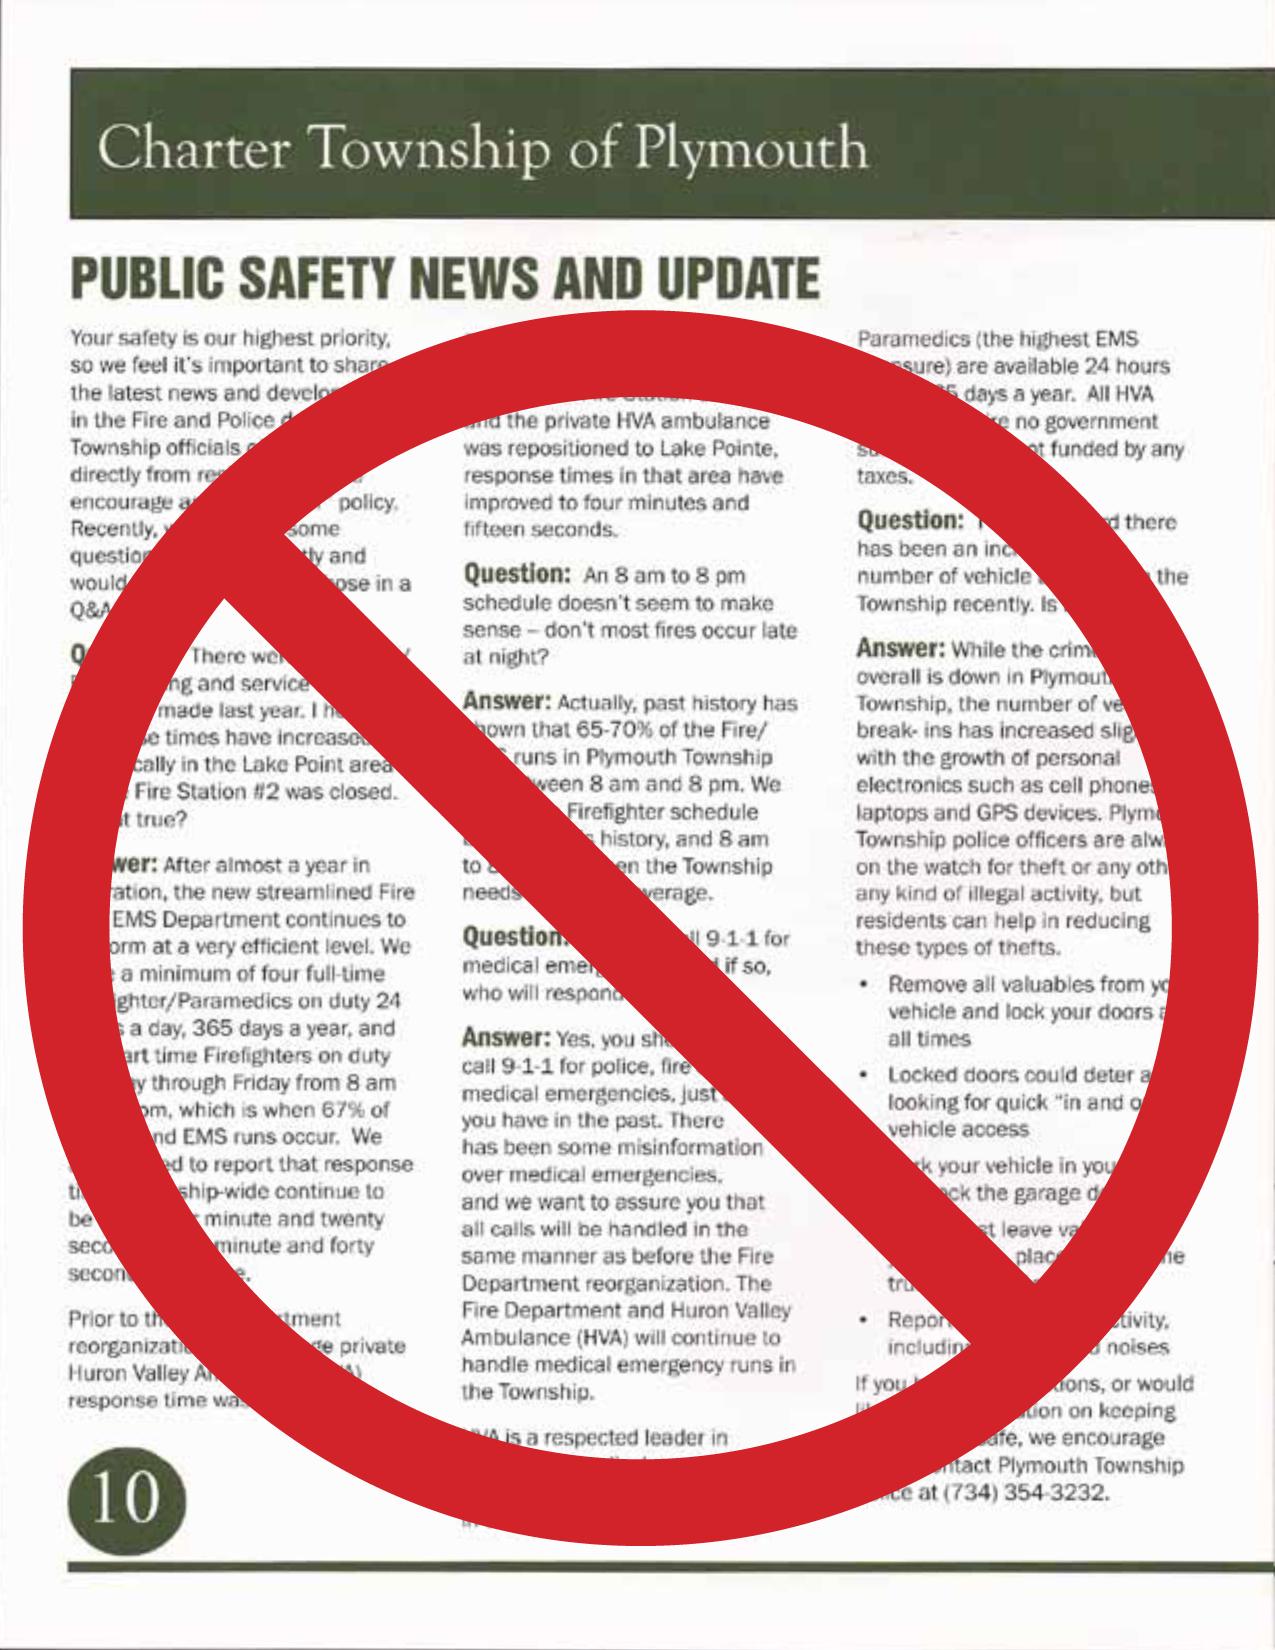 CTP newsletter